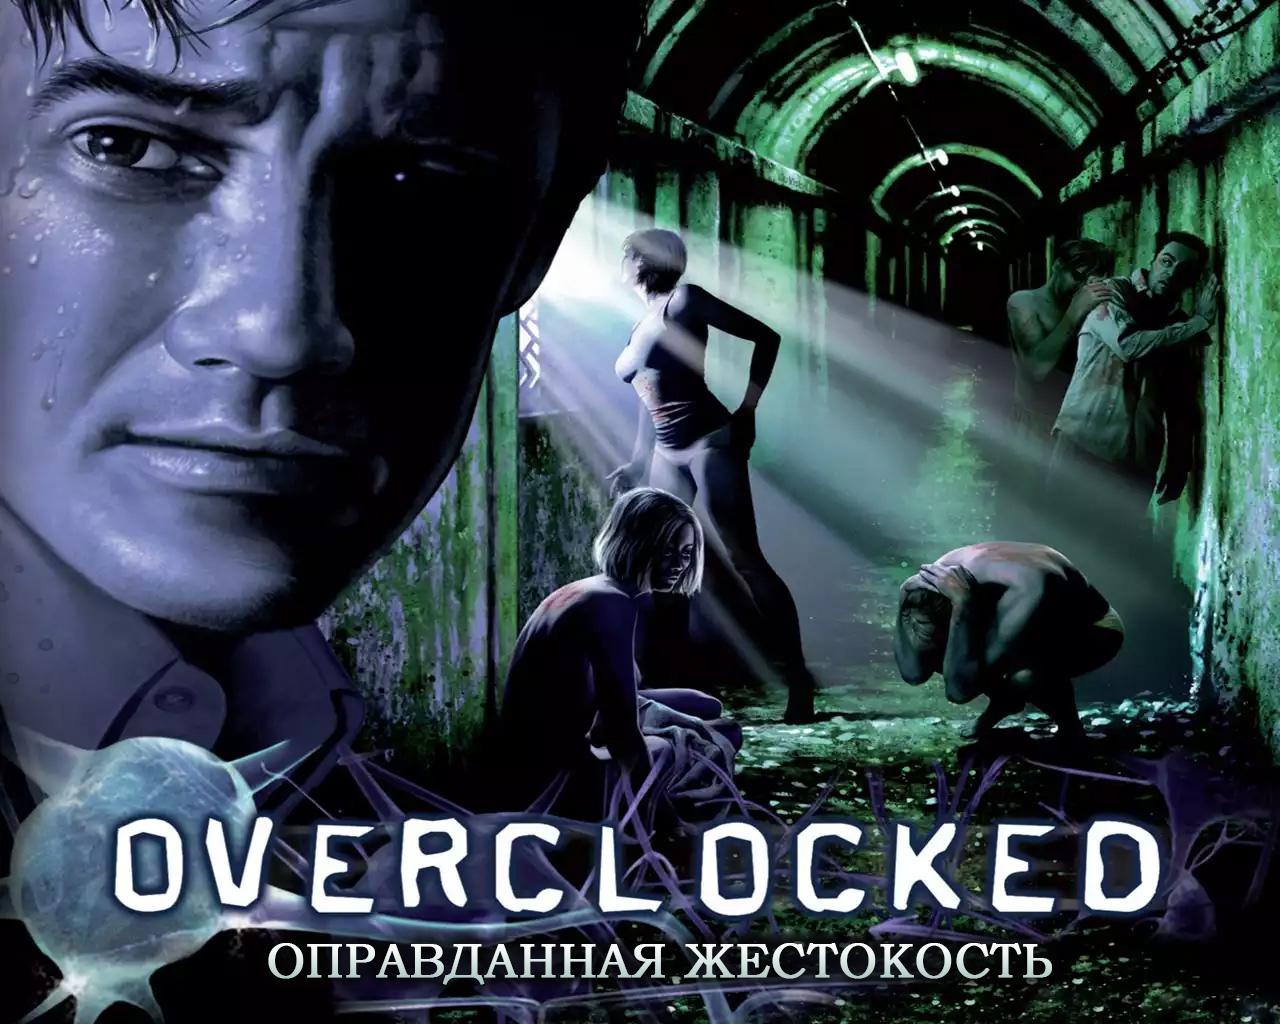 Оправданная жестокость   Overclocked - A History of Violence (Rus)